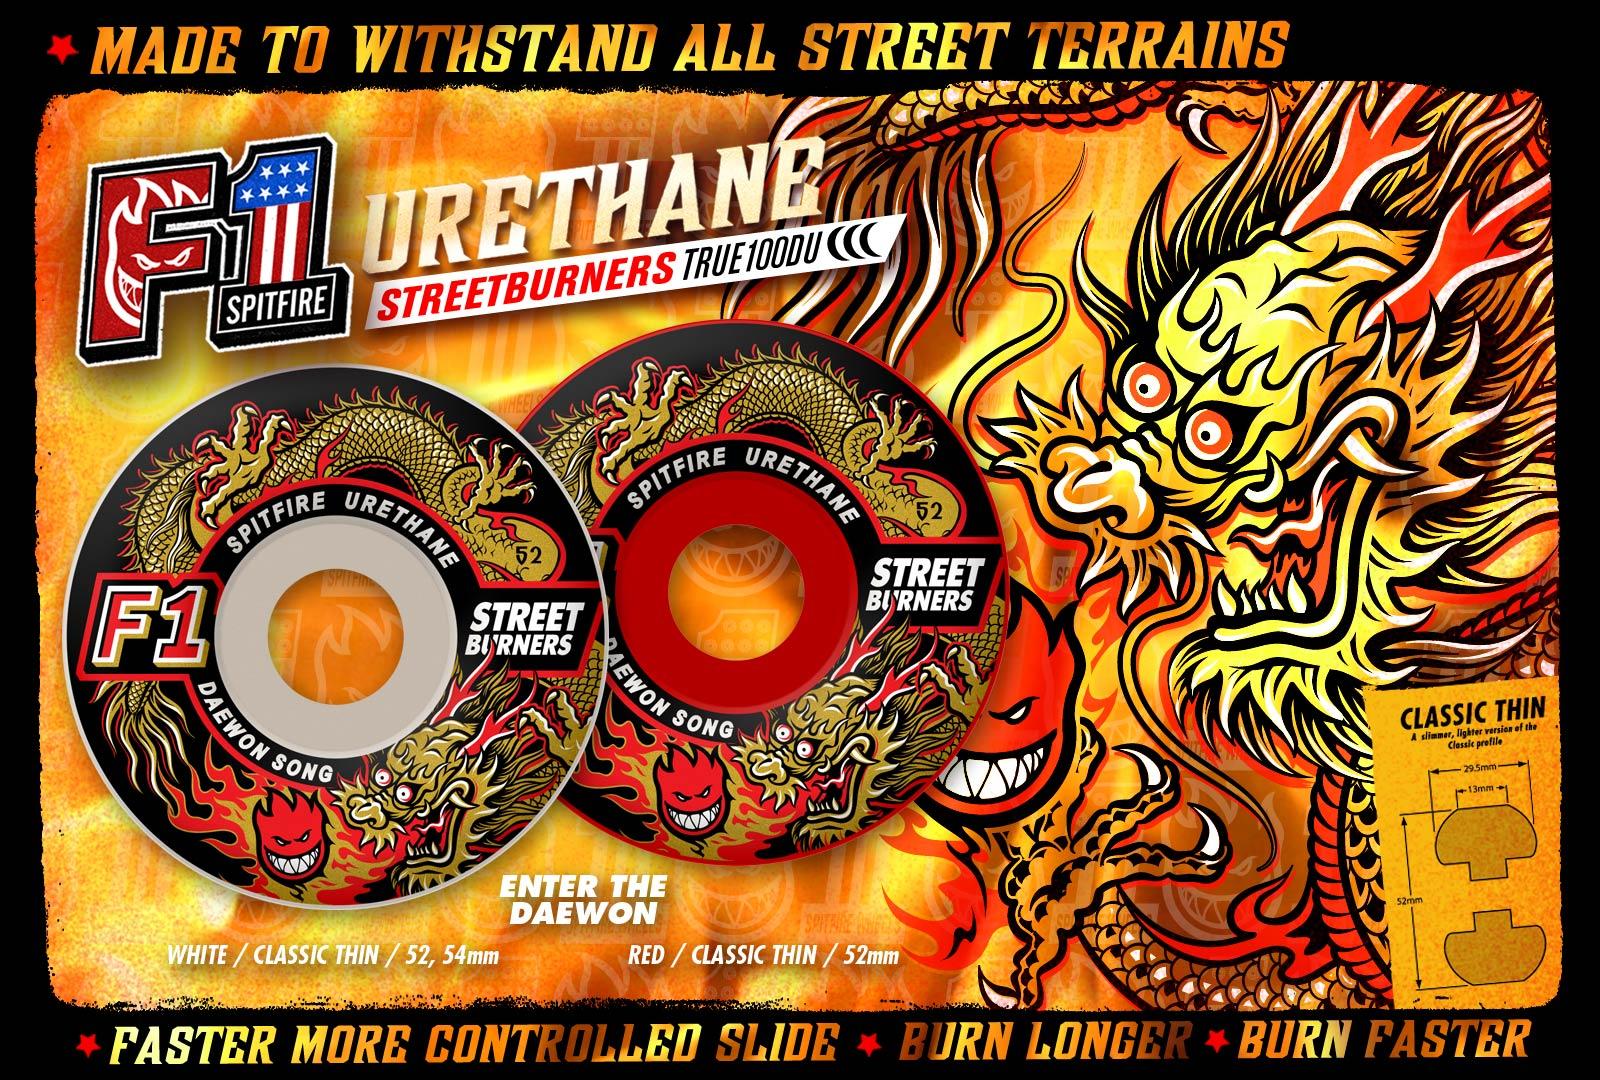 Spitfire Skateboards Wallpaper 52mm wheels 1600x1080